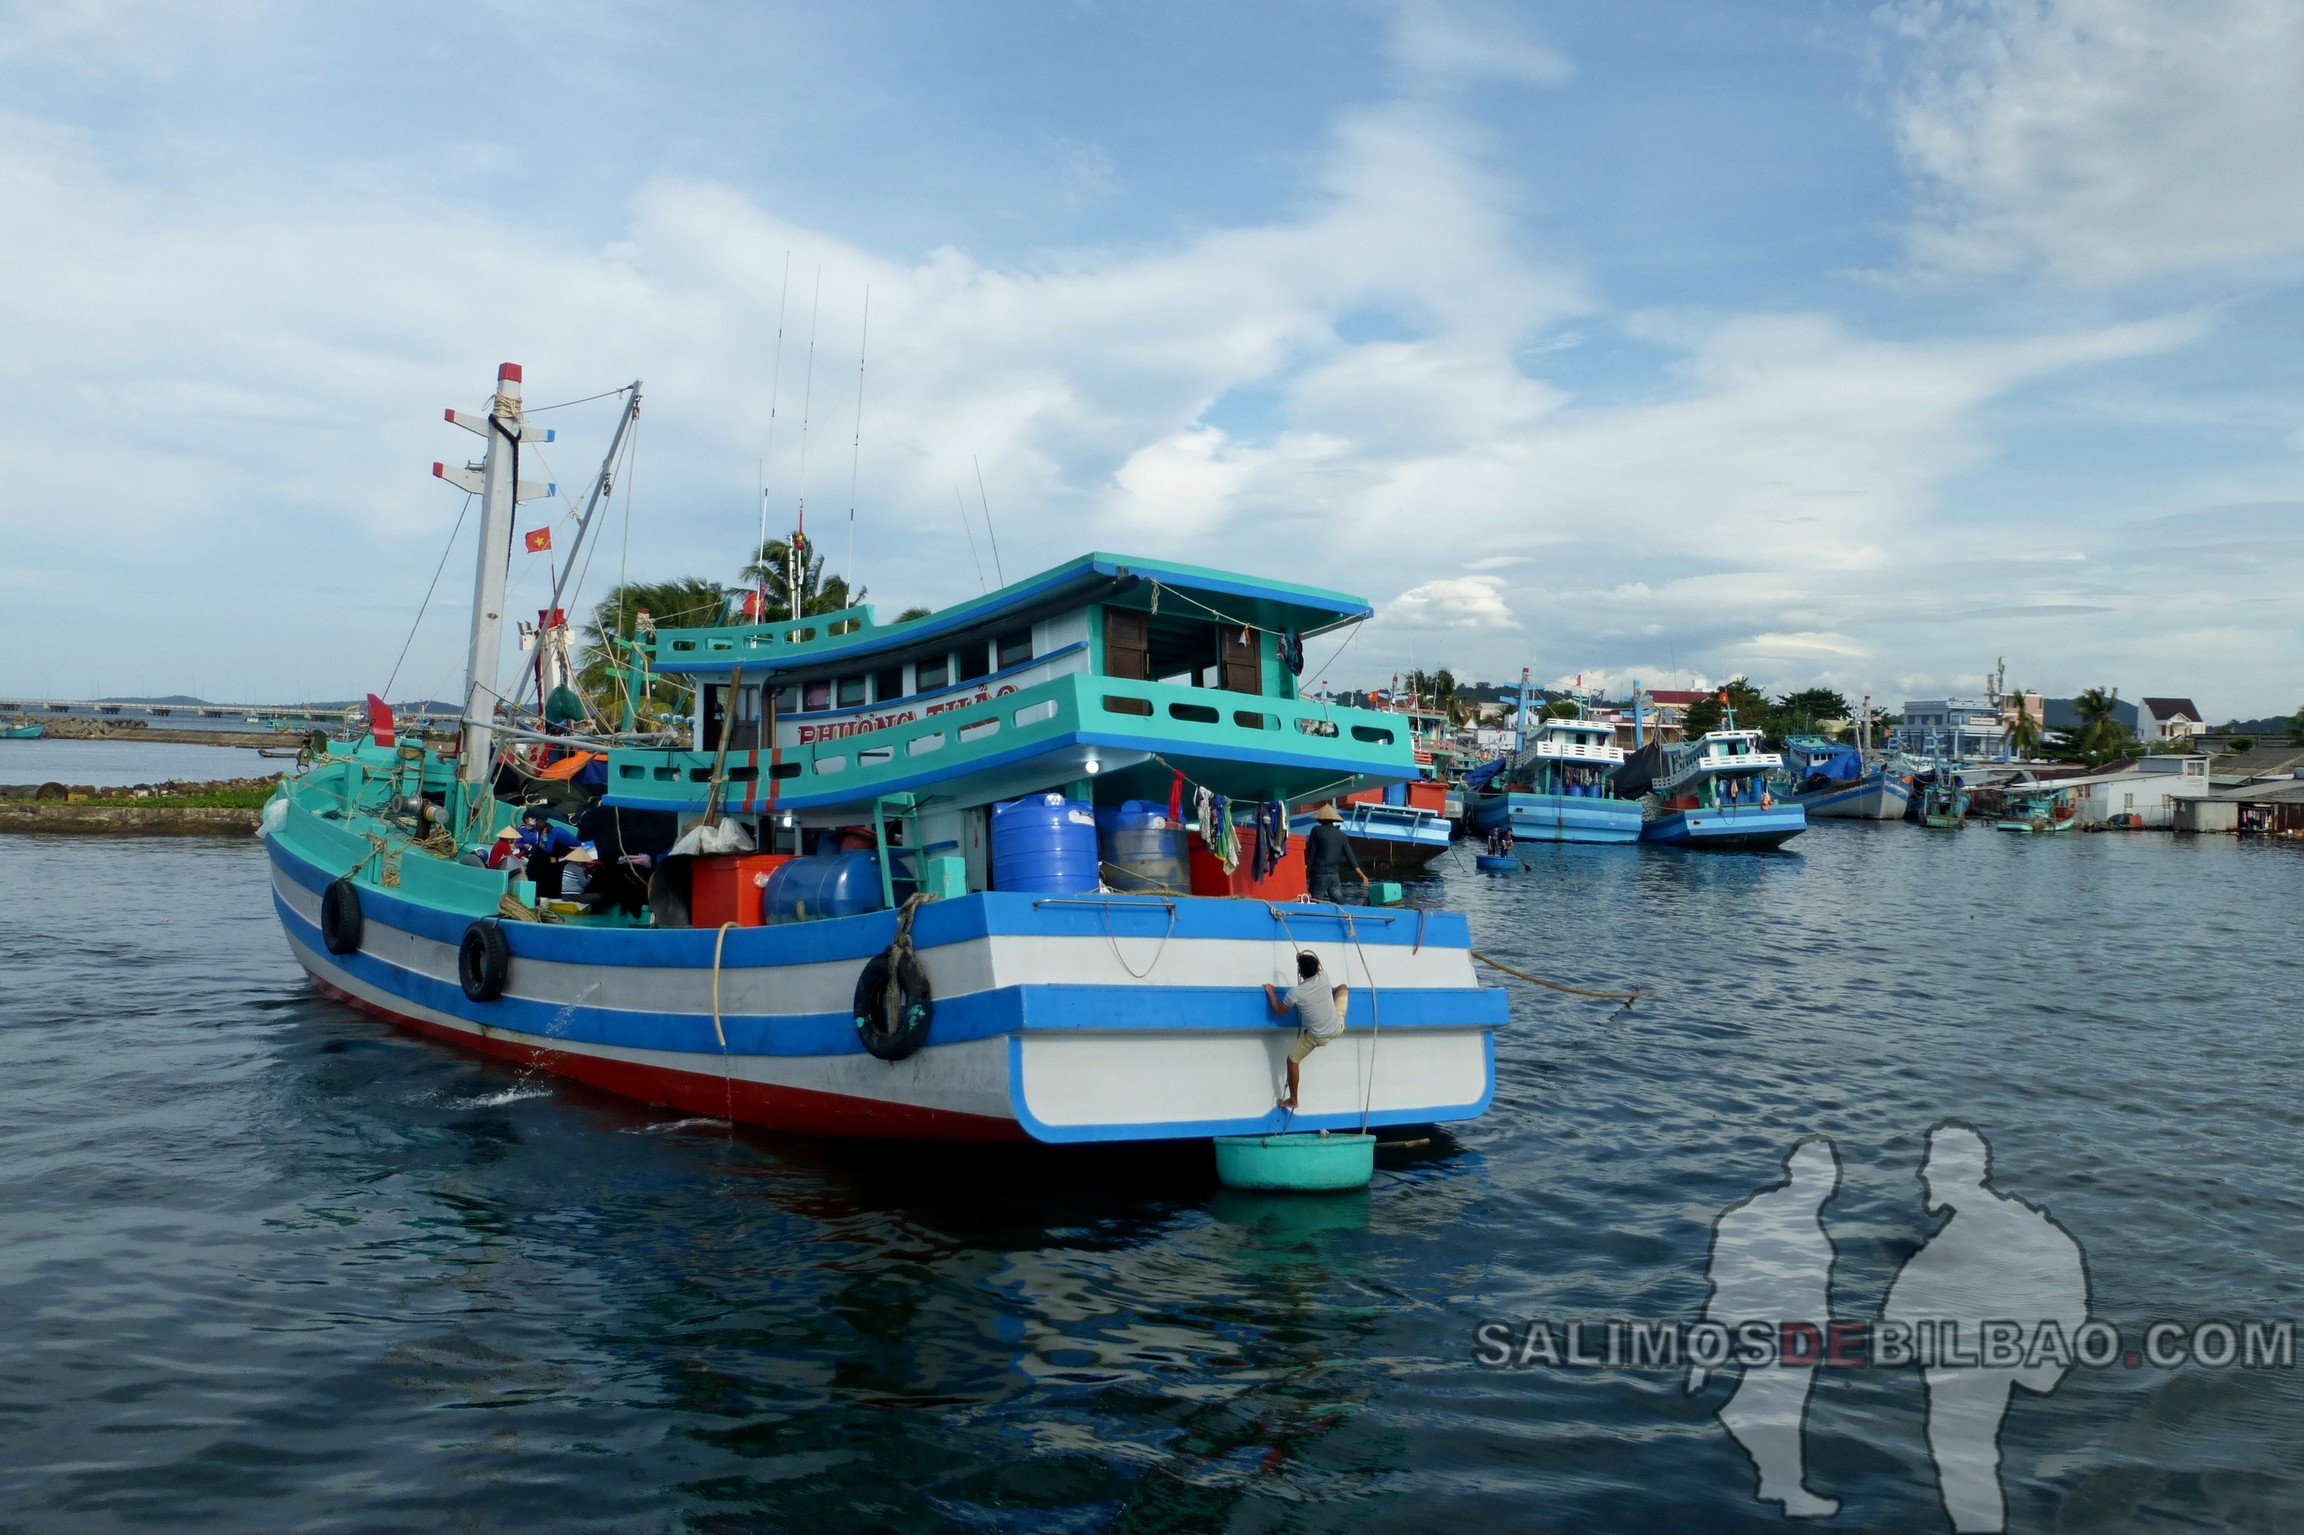 0070. Excursión al norte, Puerto de Duong Dong, Phu Quoc